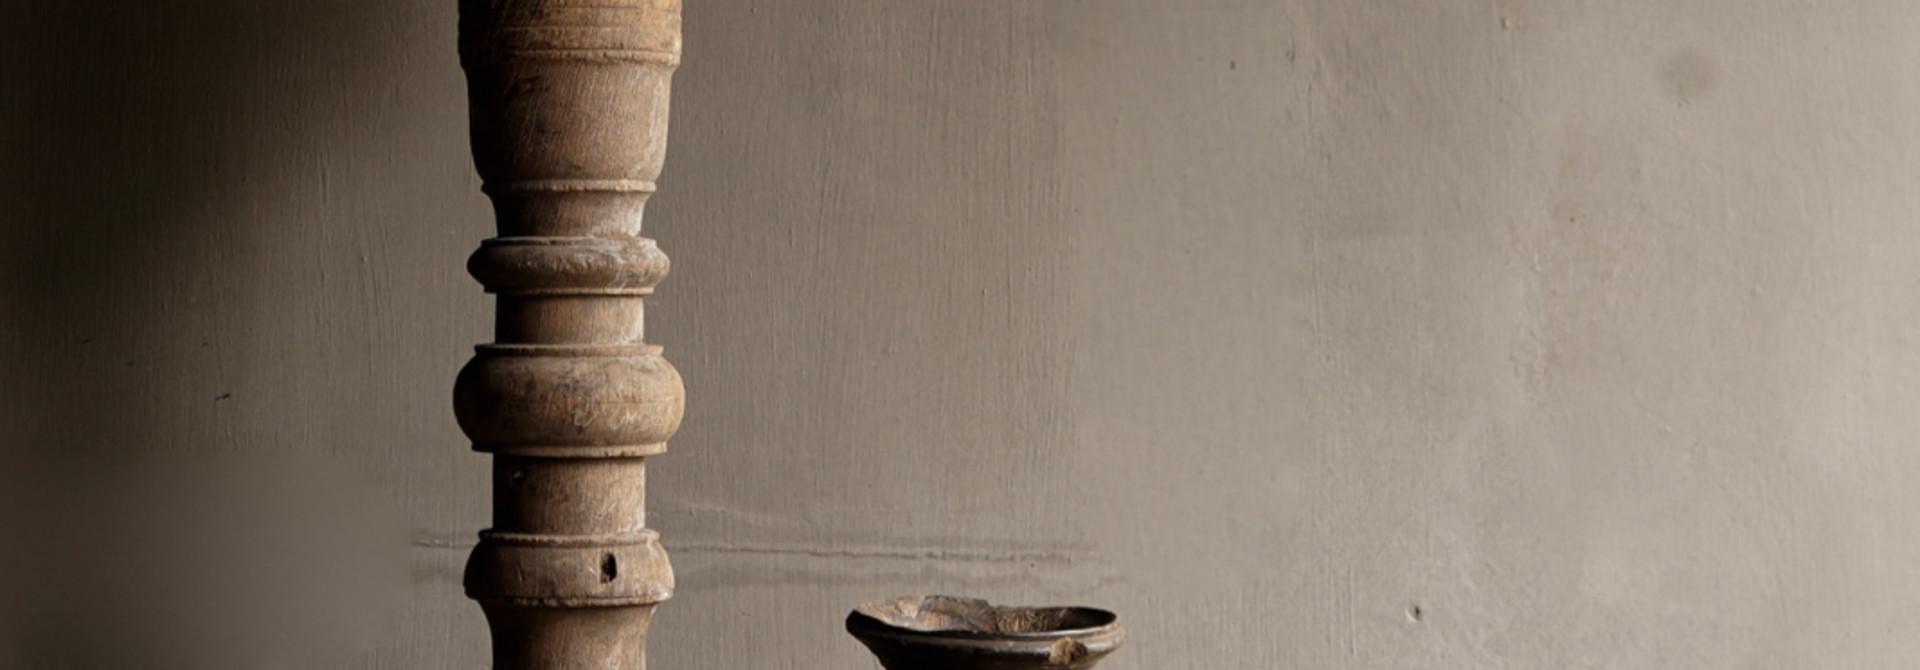 Beautiful Old Wooden Baluster lamp base